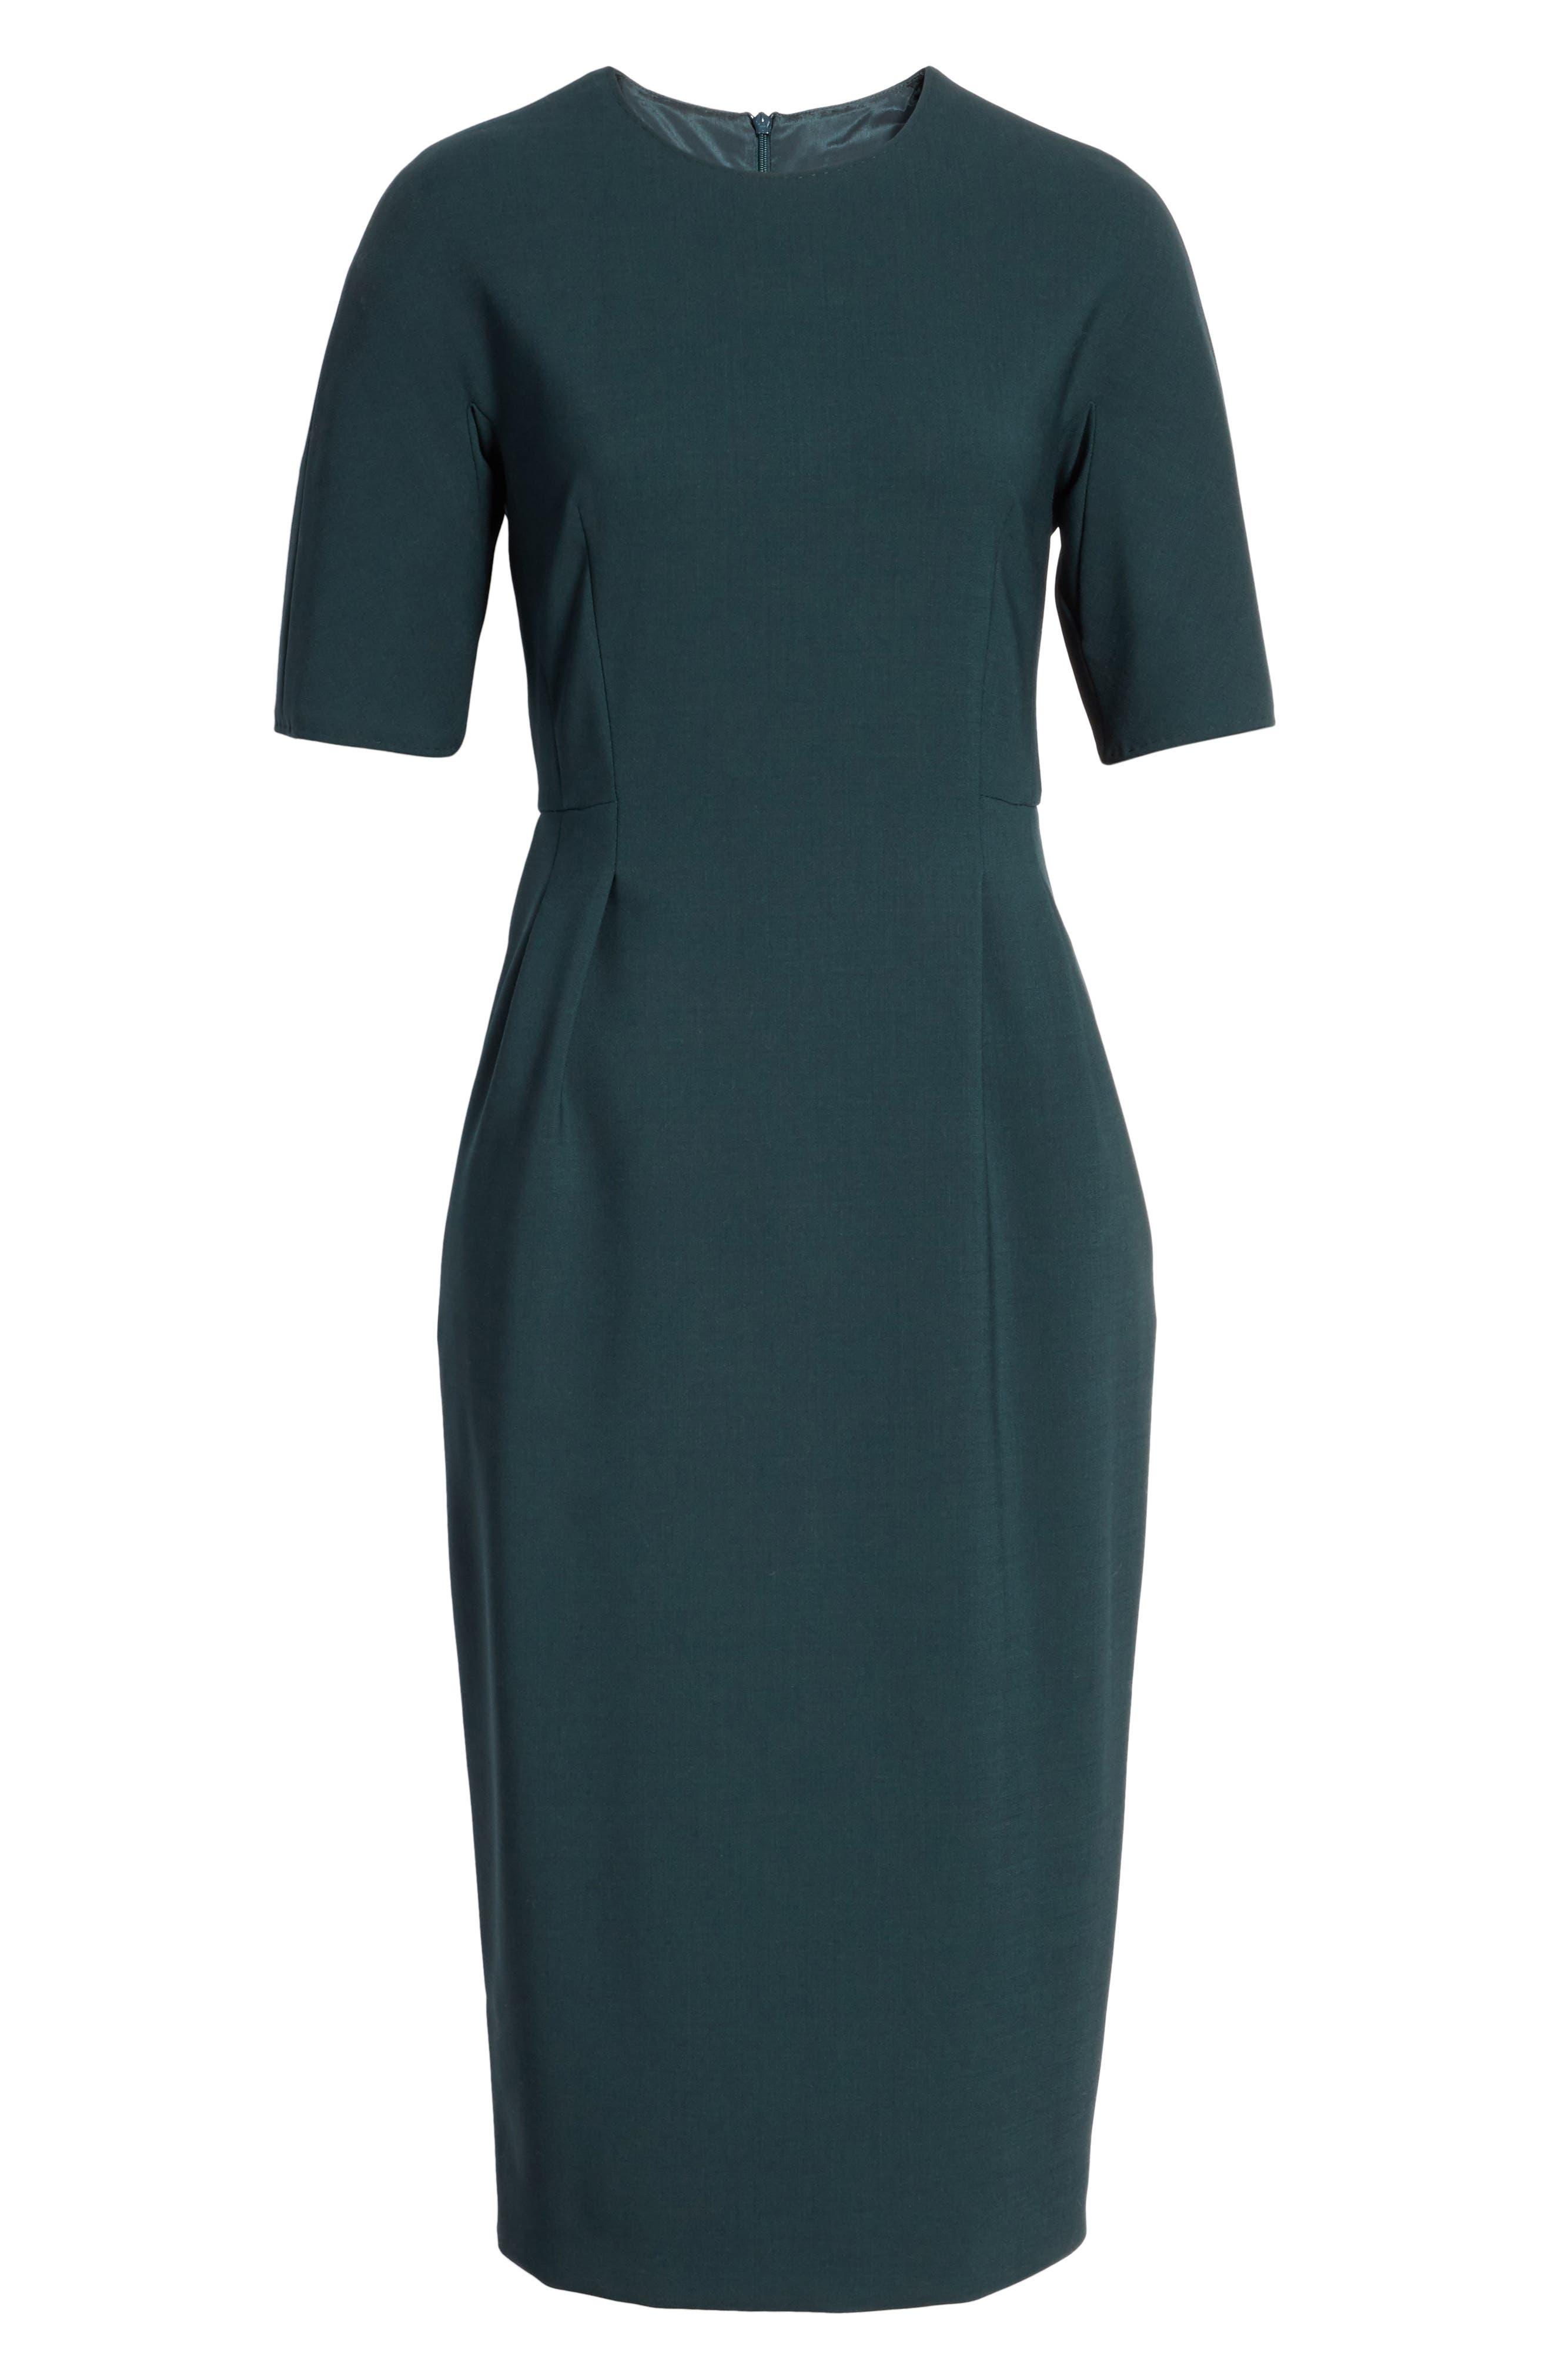 Umano Stretch Wool Sheath Dress,                             Alternate thumbnail 6, color,                             304